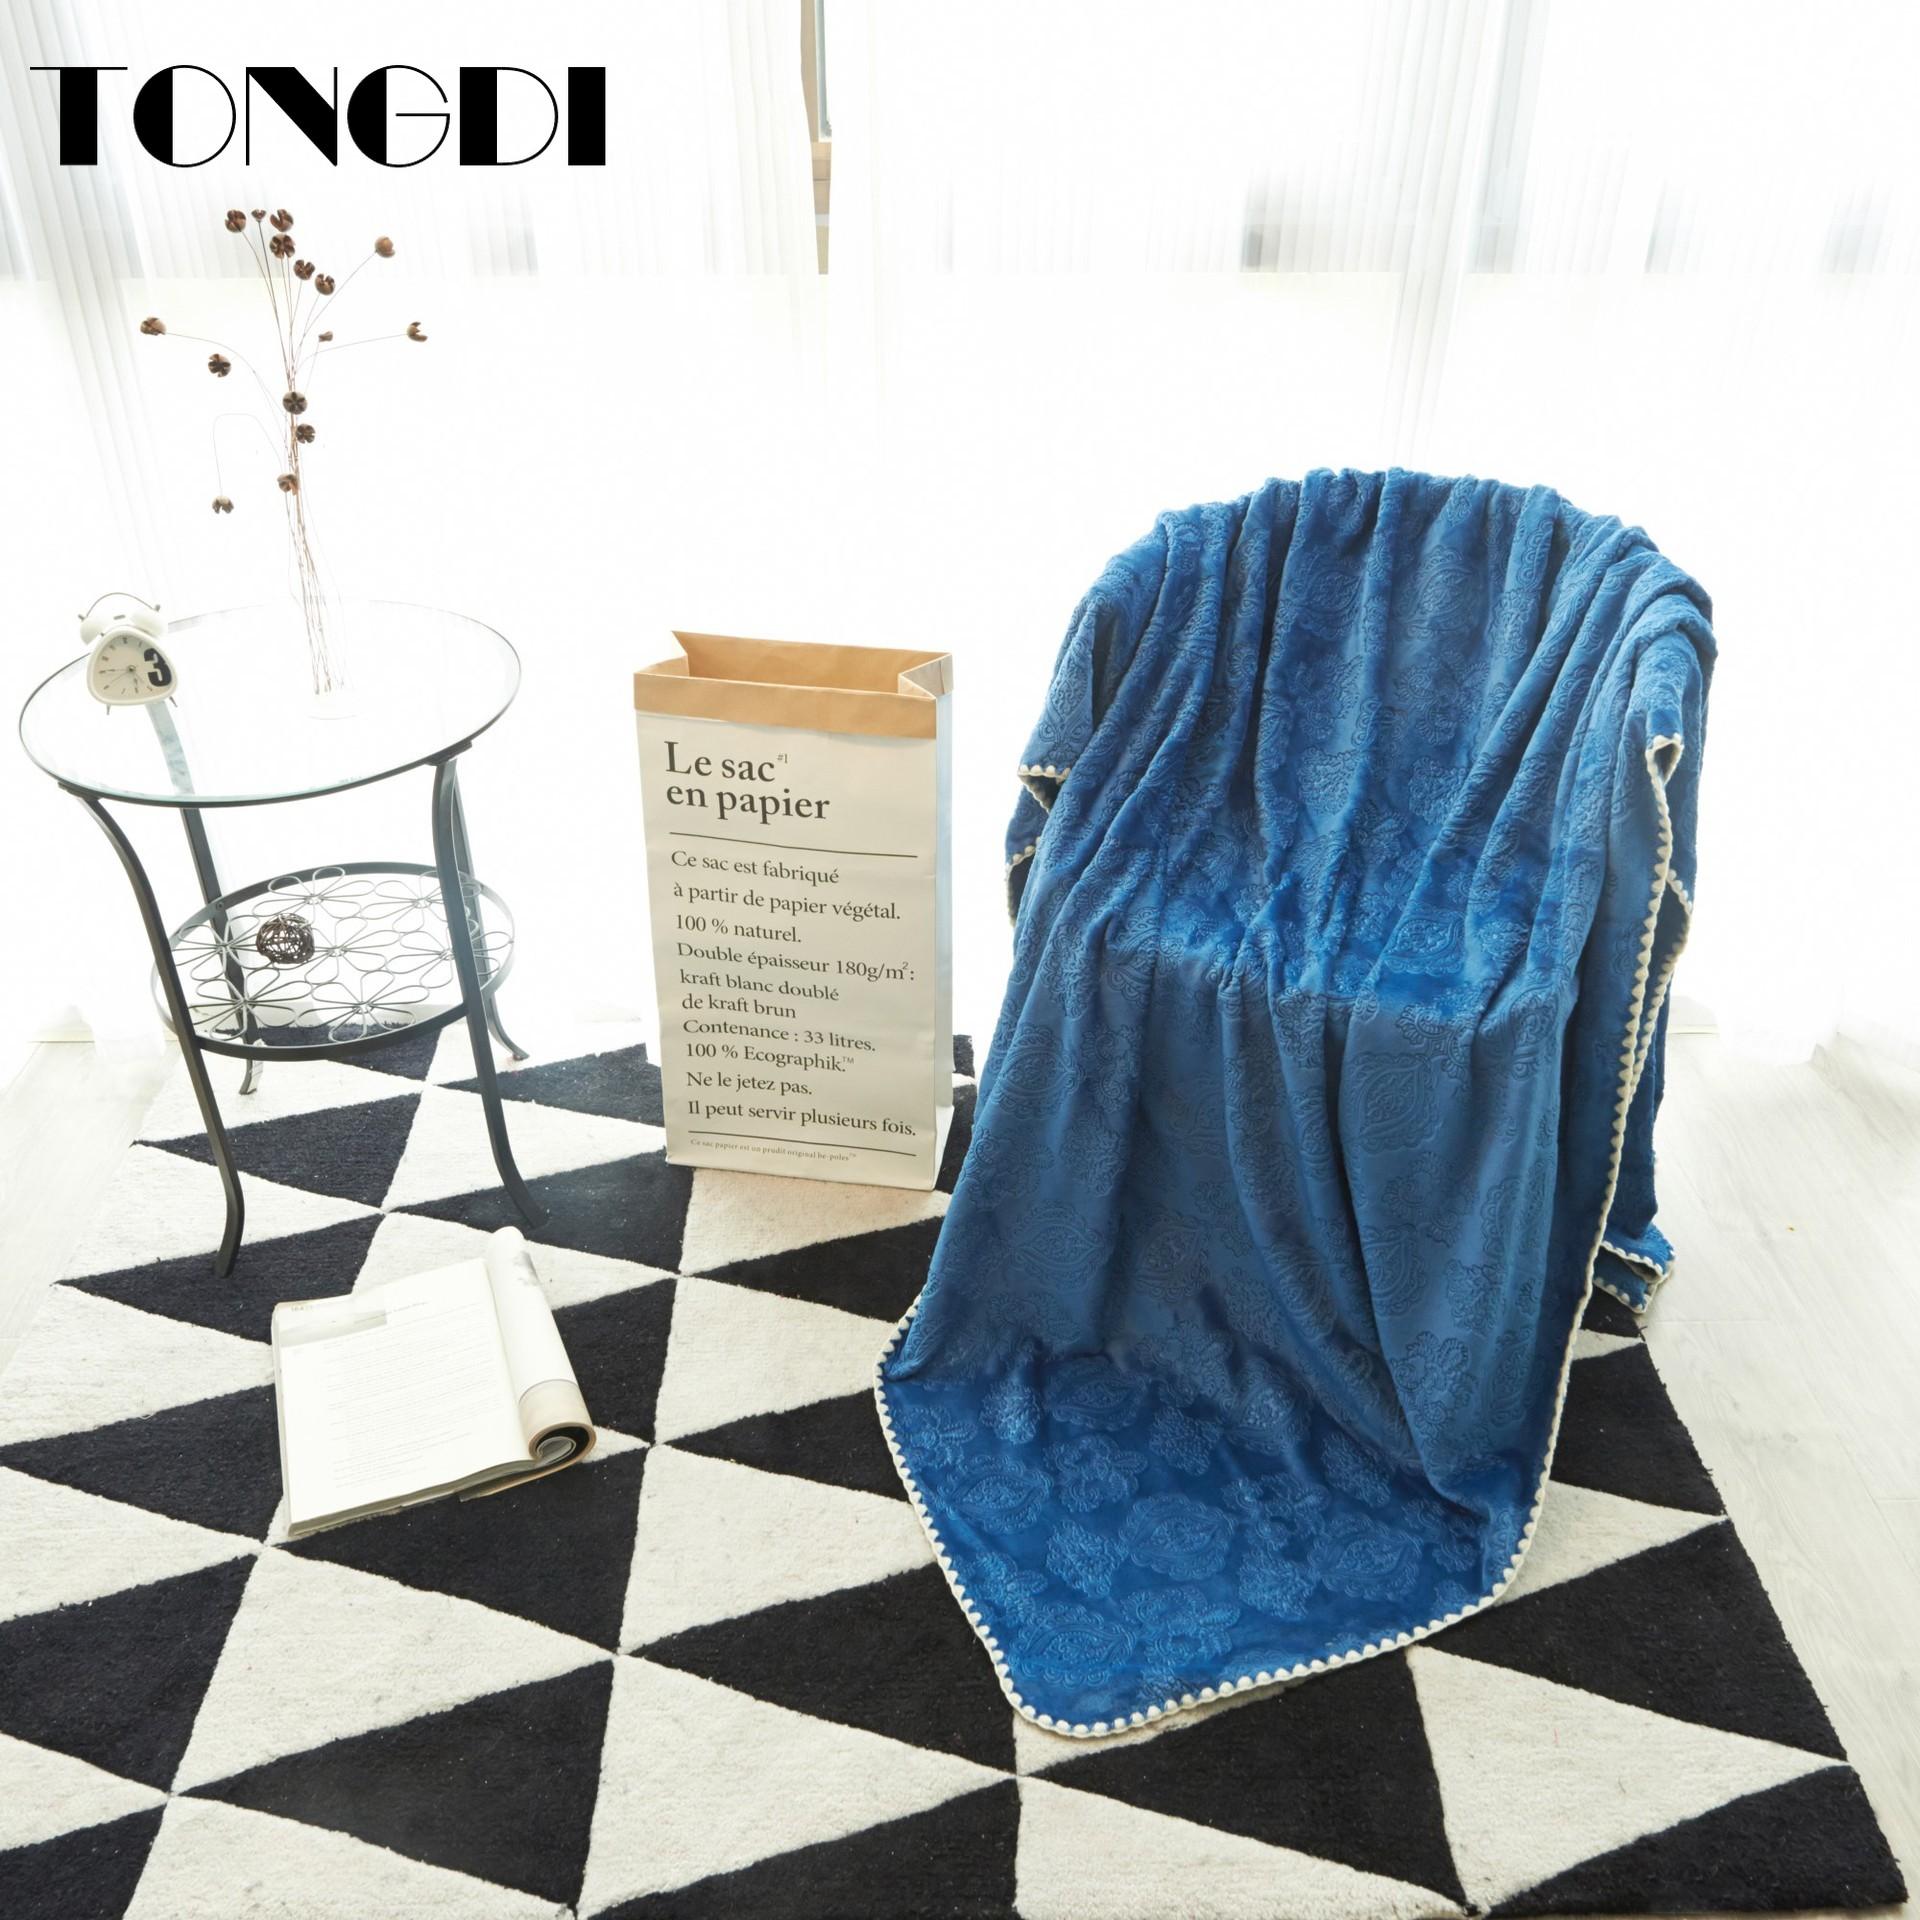 TONGDI Soft Warm Light Fannel Fleece Luxury Pattern Lace Fur Blanket Solid Winter Couch Cover Bed Machine Wash Blanket Bedspread